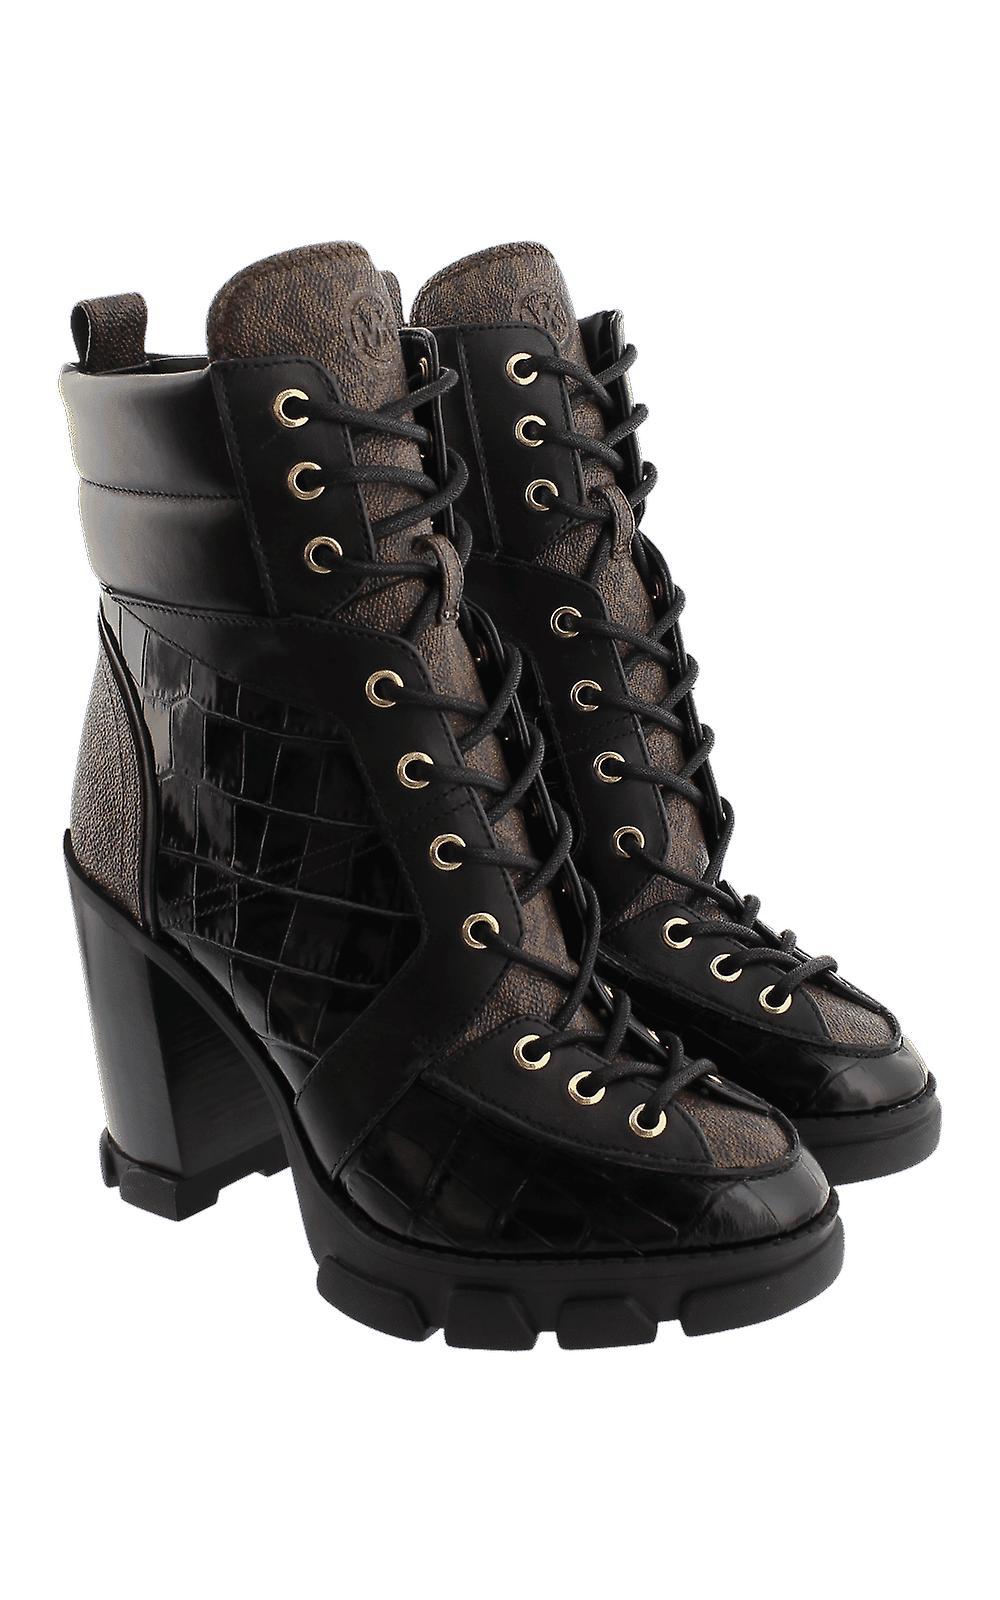 Michael Kors Ridley Blonder Opp Bootie Svart 40F0RIHE6E sko